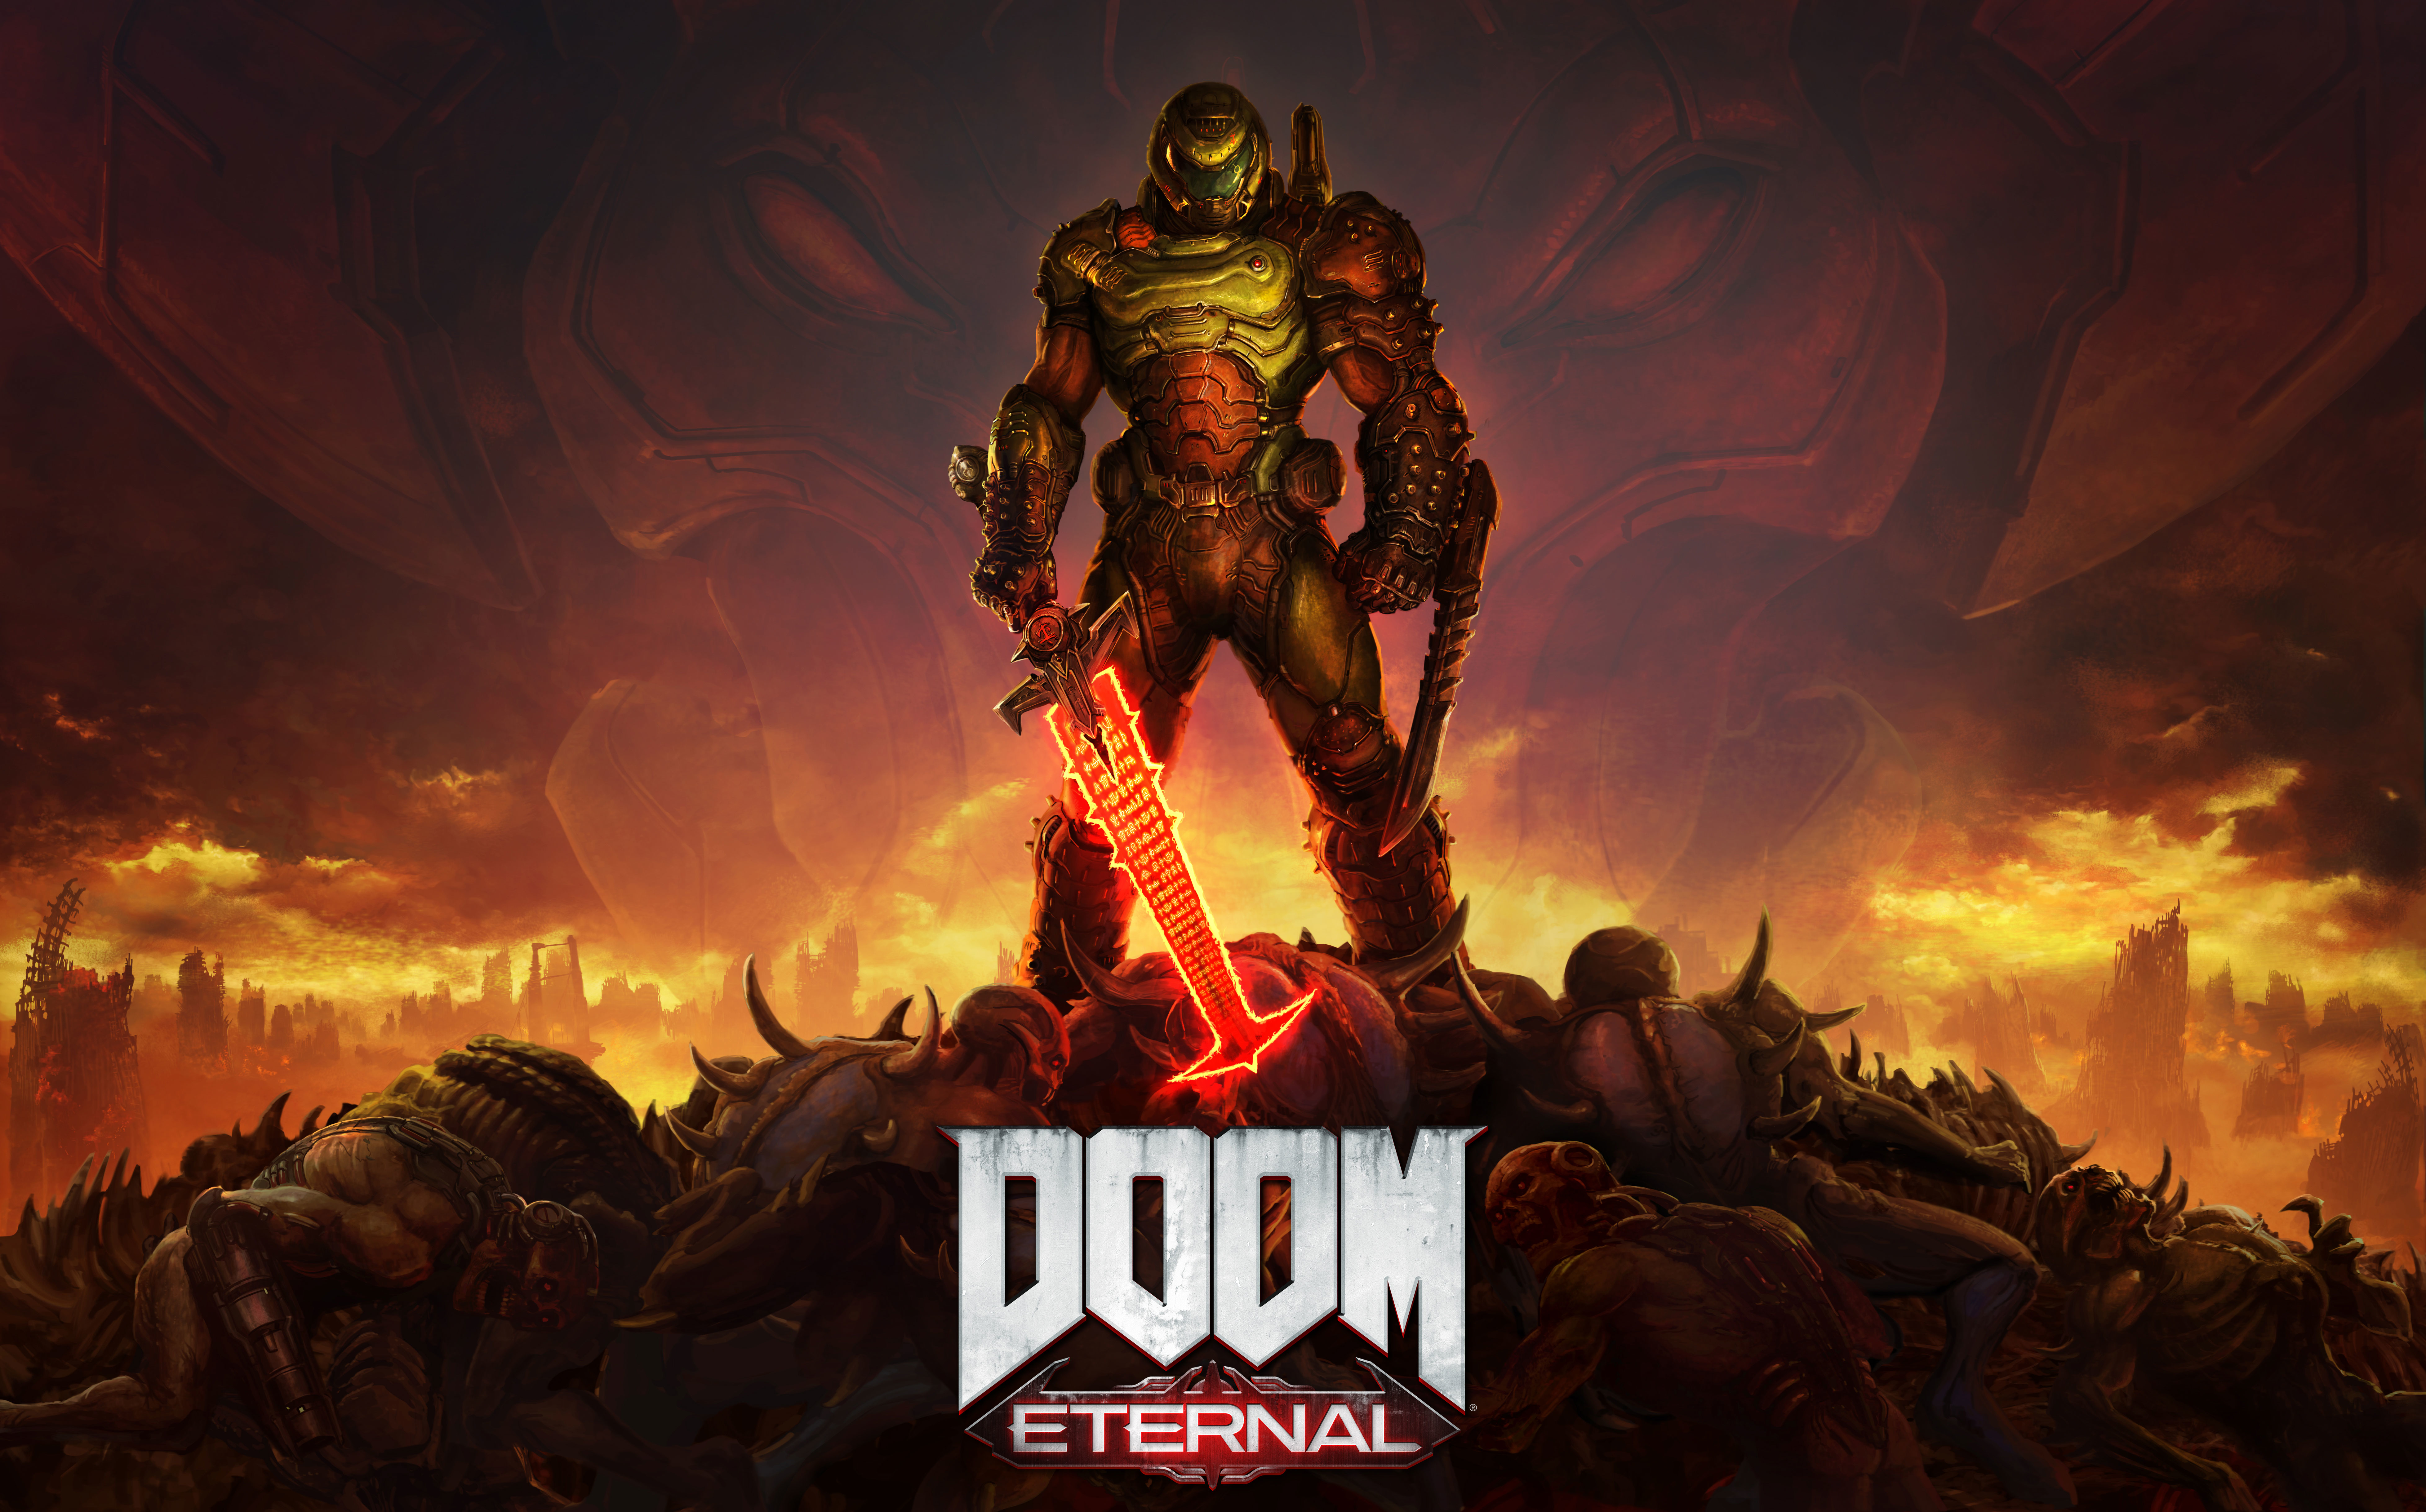 DOOM Eternal 8K Poster Wallpaper, HD Games 4K Wallpapers ...